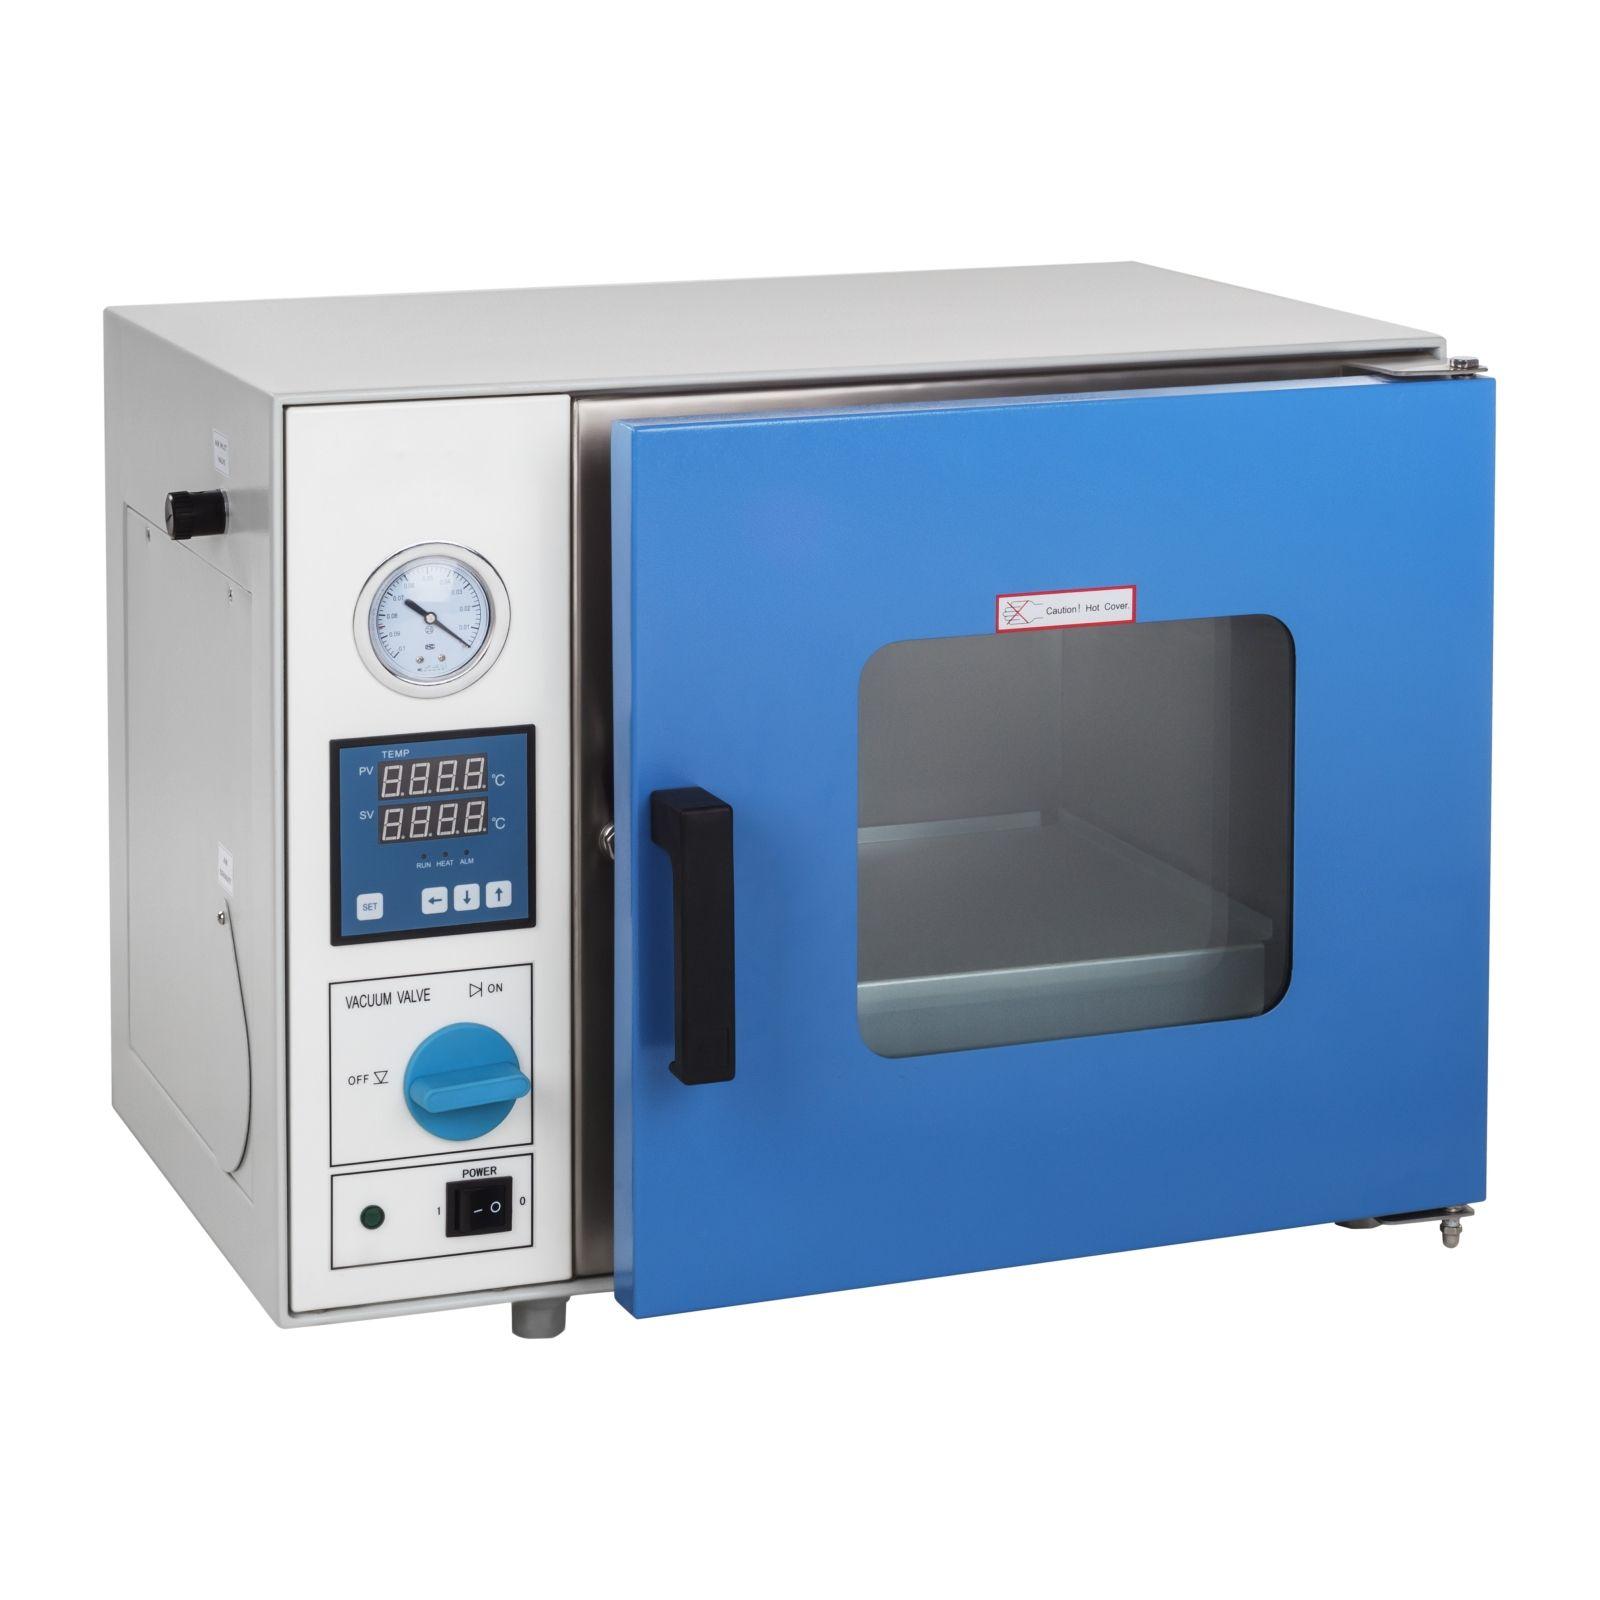 goldbrunn essiccatore sottovuoto ad armadio - 1.450 watt 1450